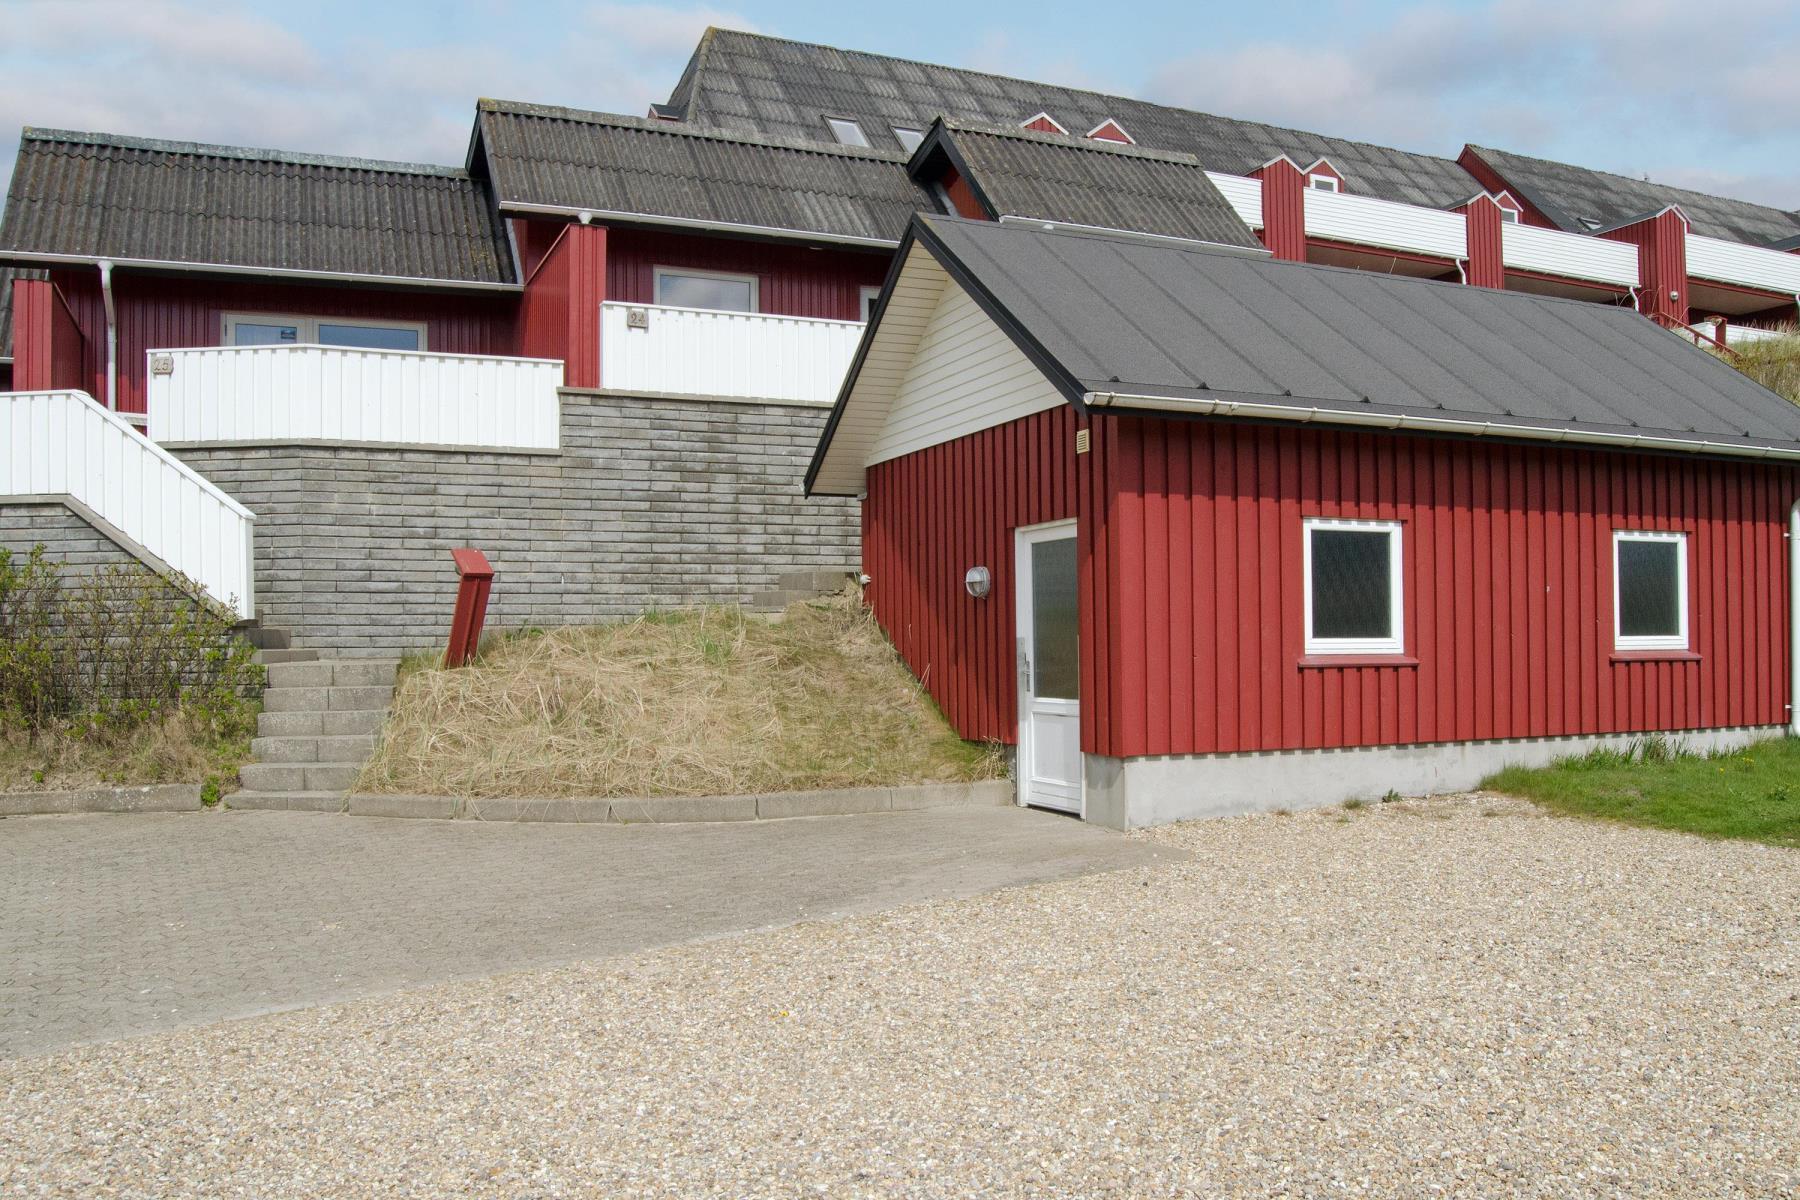 Ferienhaus 1006 - Hjelmevej 15, App. 6